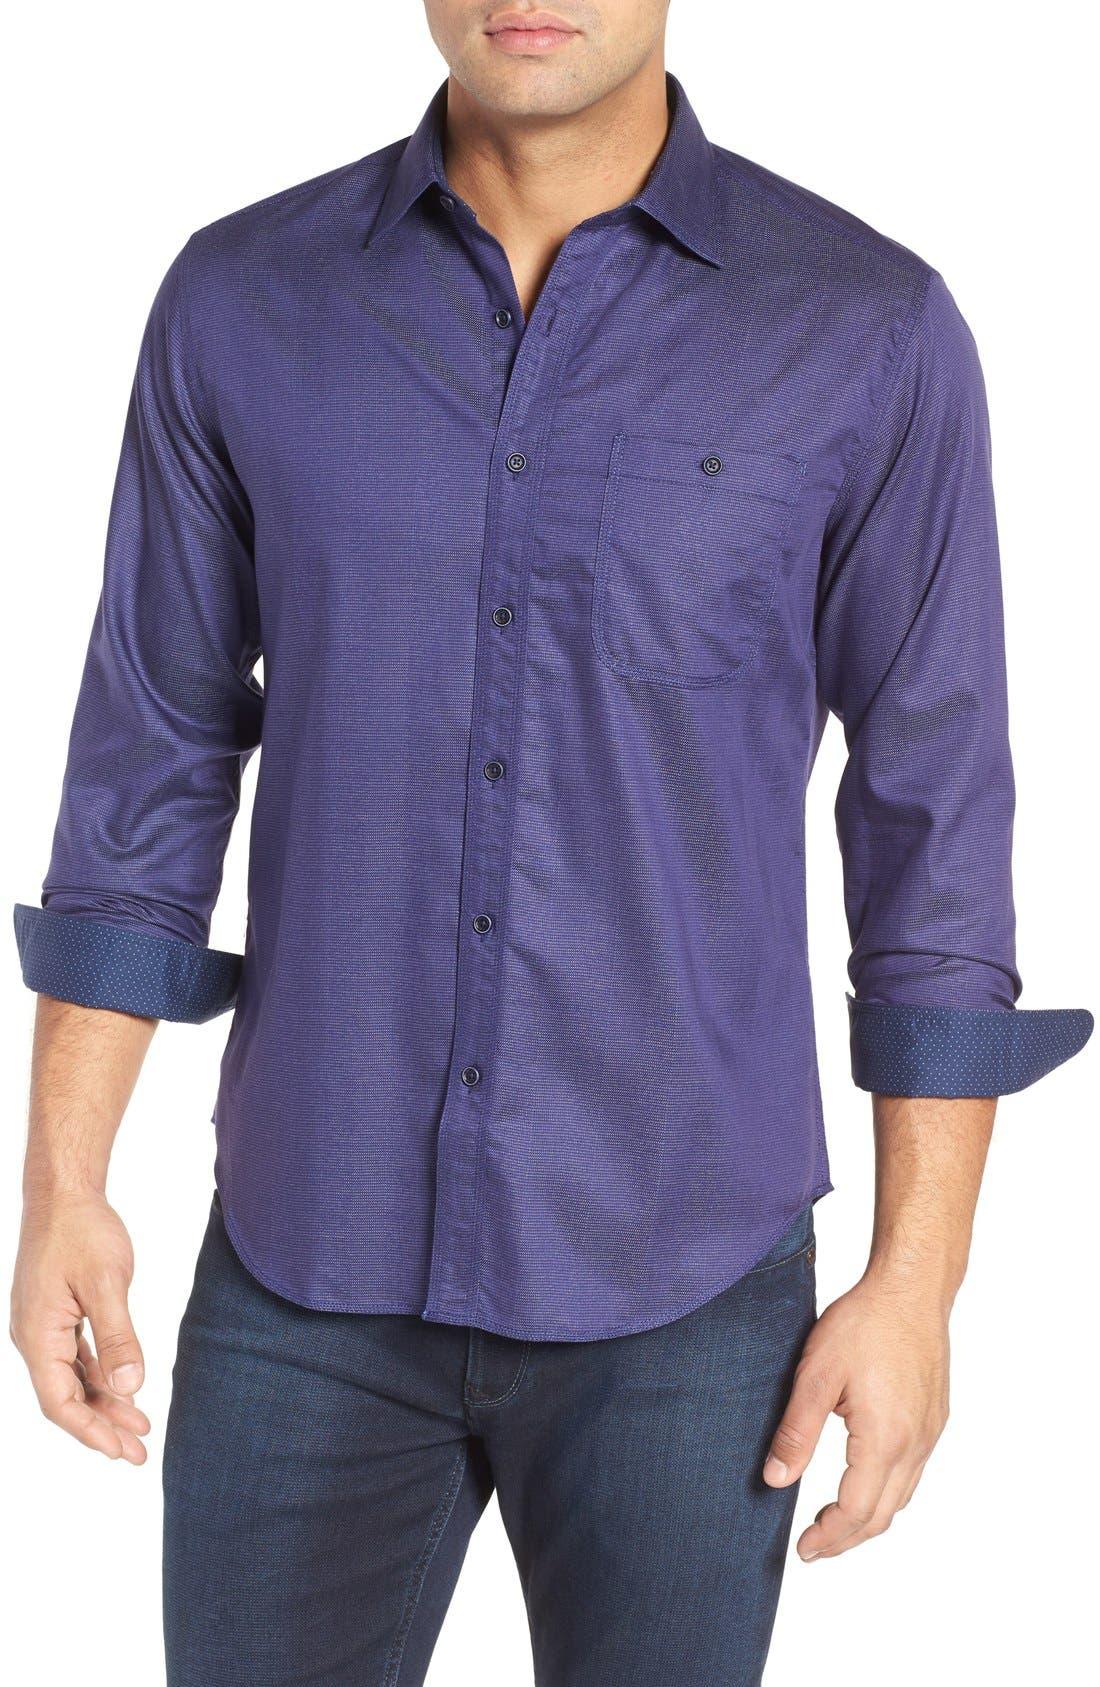 Main Image - Bugatchi Shaped Fit Stripe Jacquard Sport Shirt